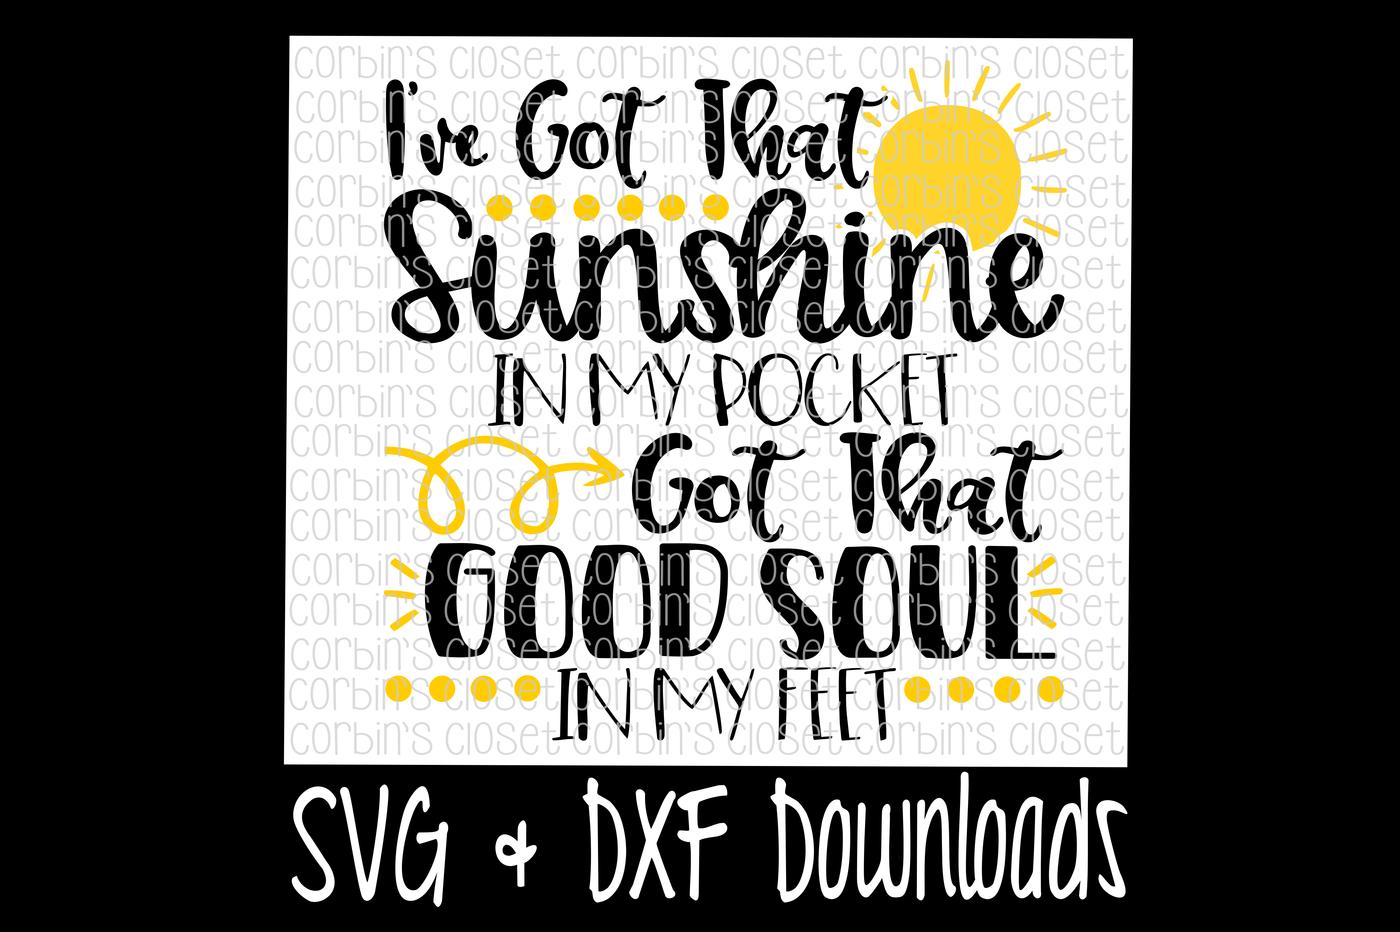 Sunshine In My Pocket Cut File By Corbins Svg Thehungryjpeg Com